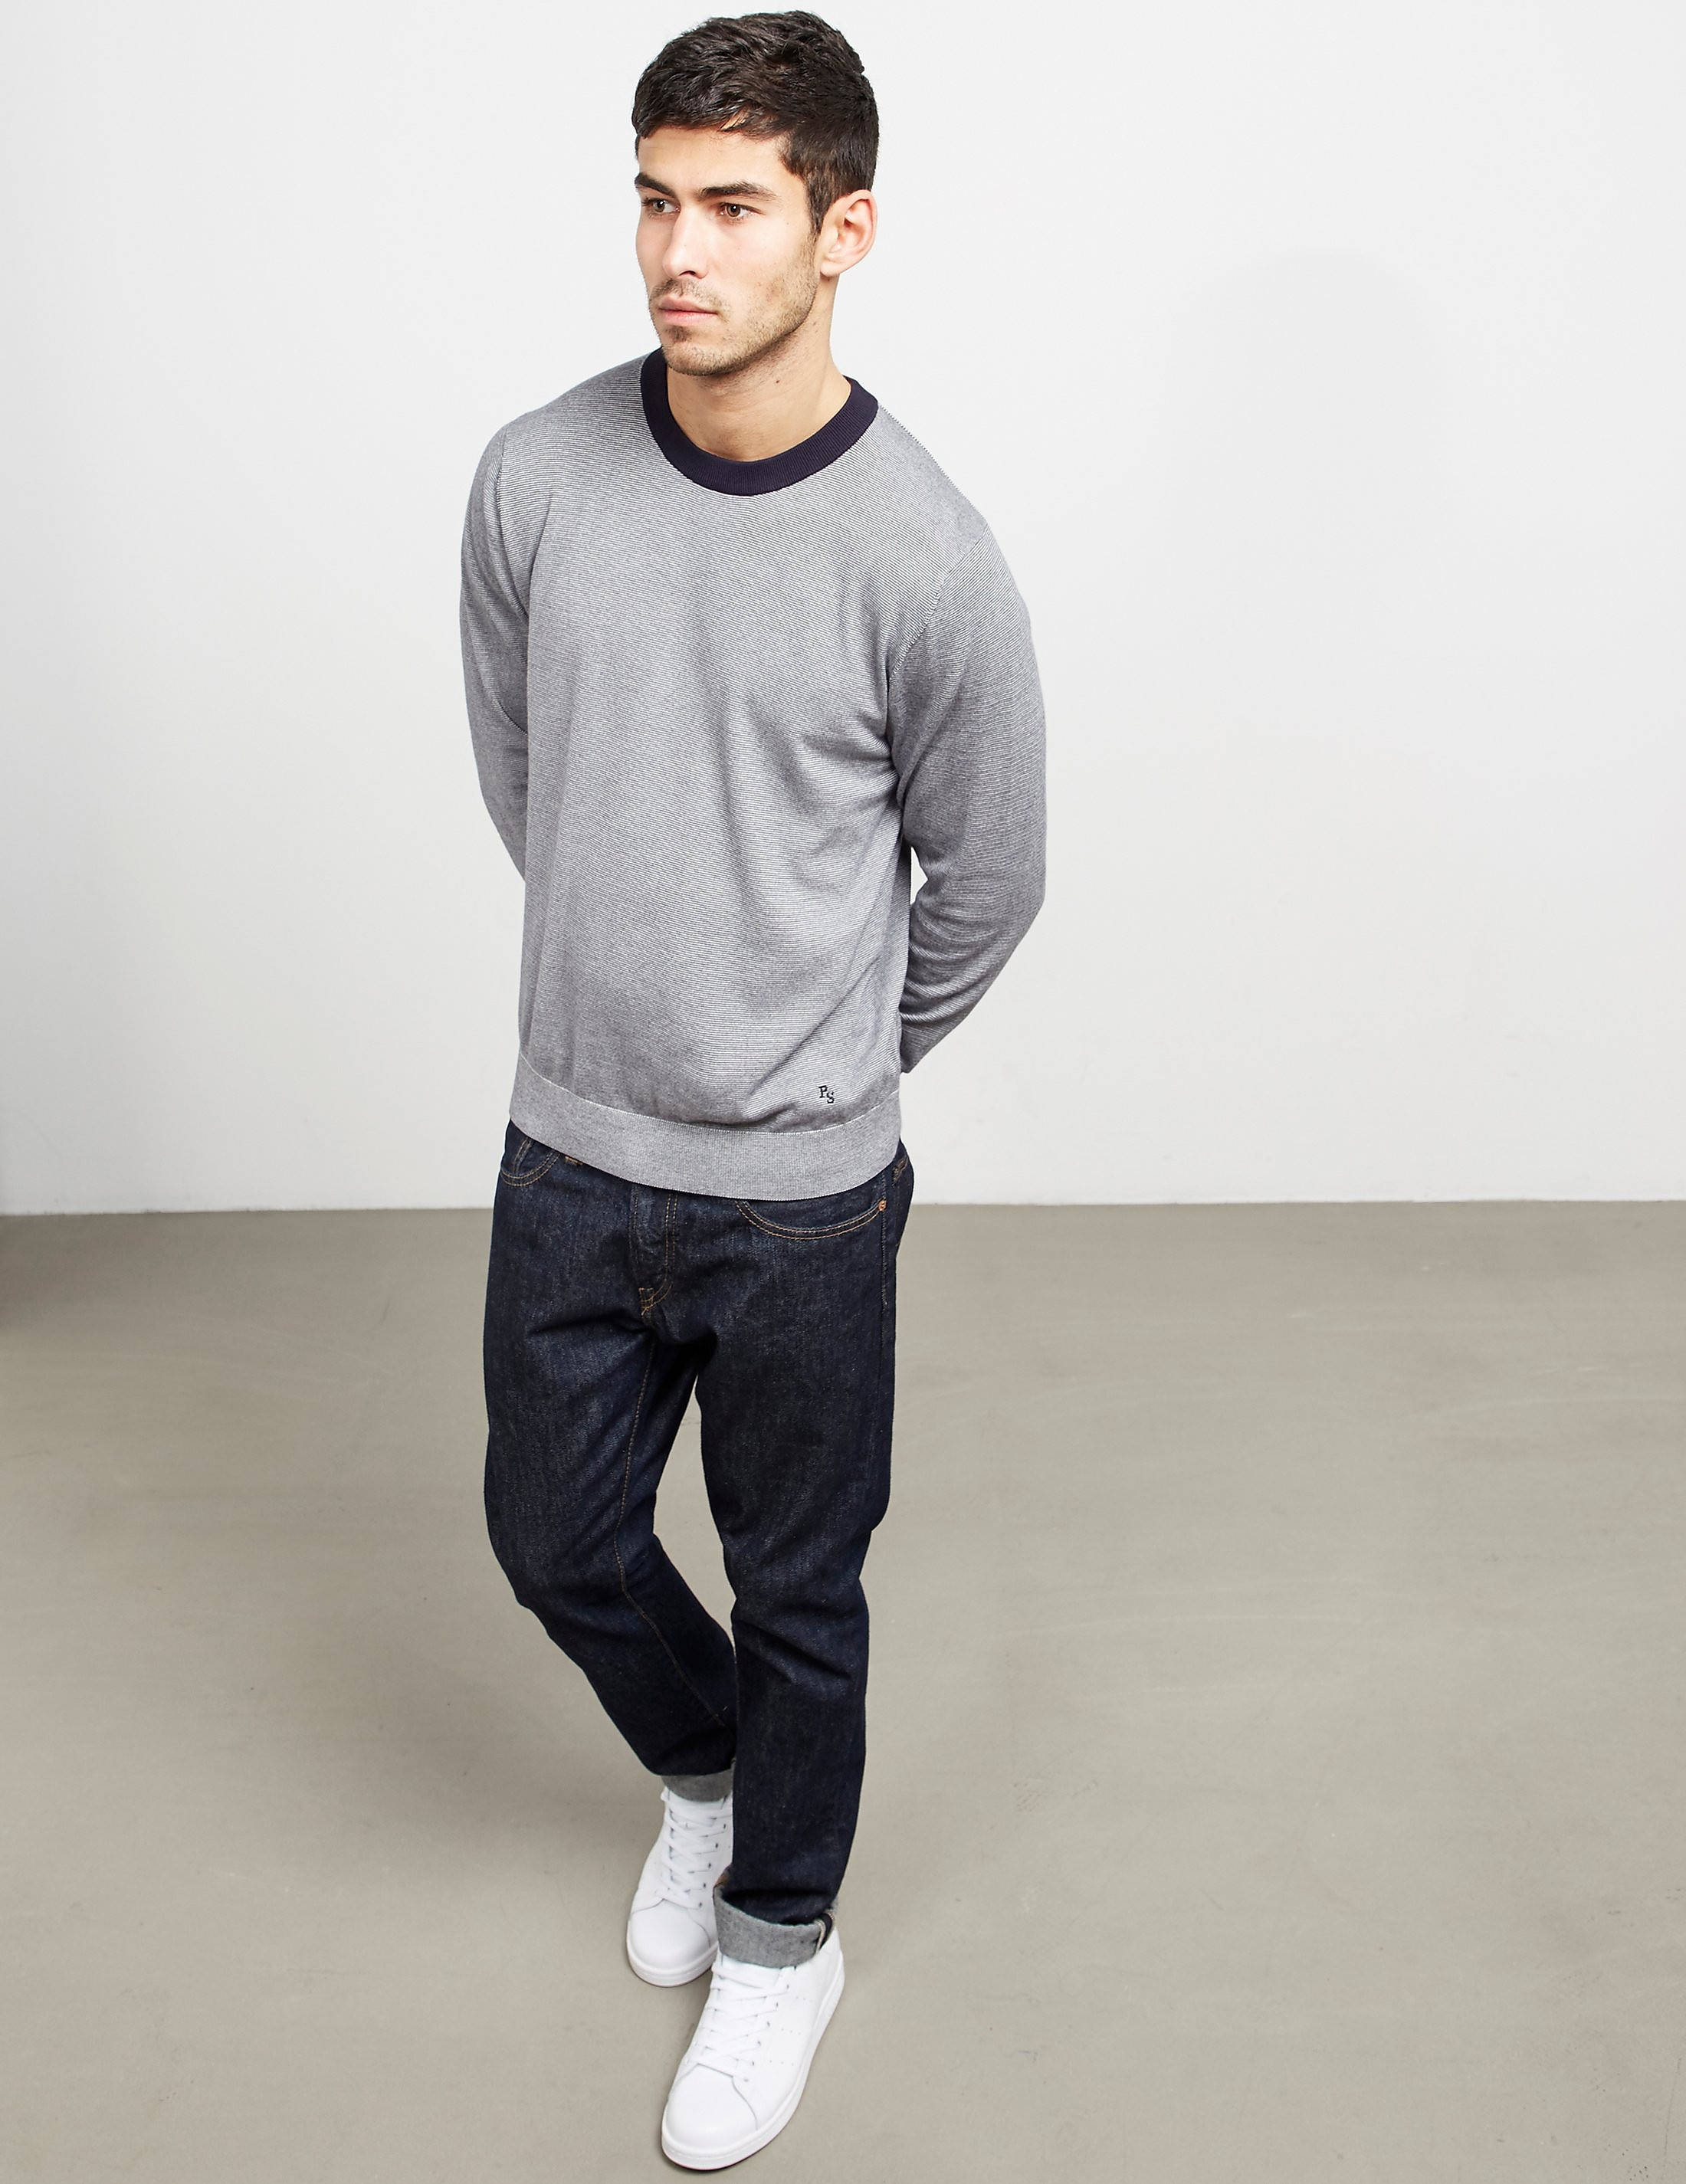 Paul Smith Fine Stripe Knitted Jumper